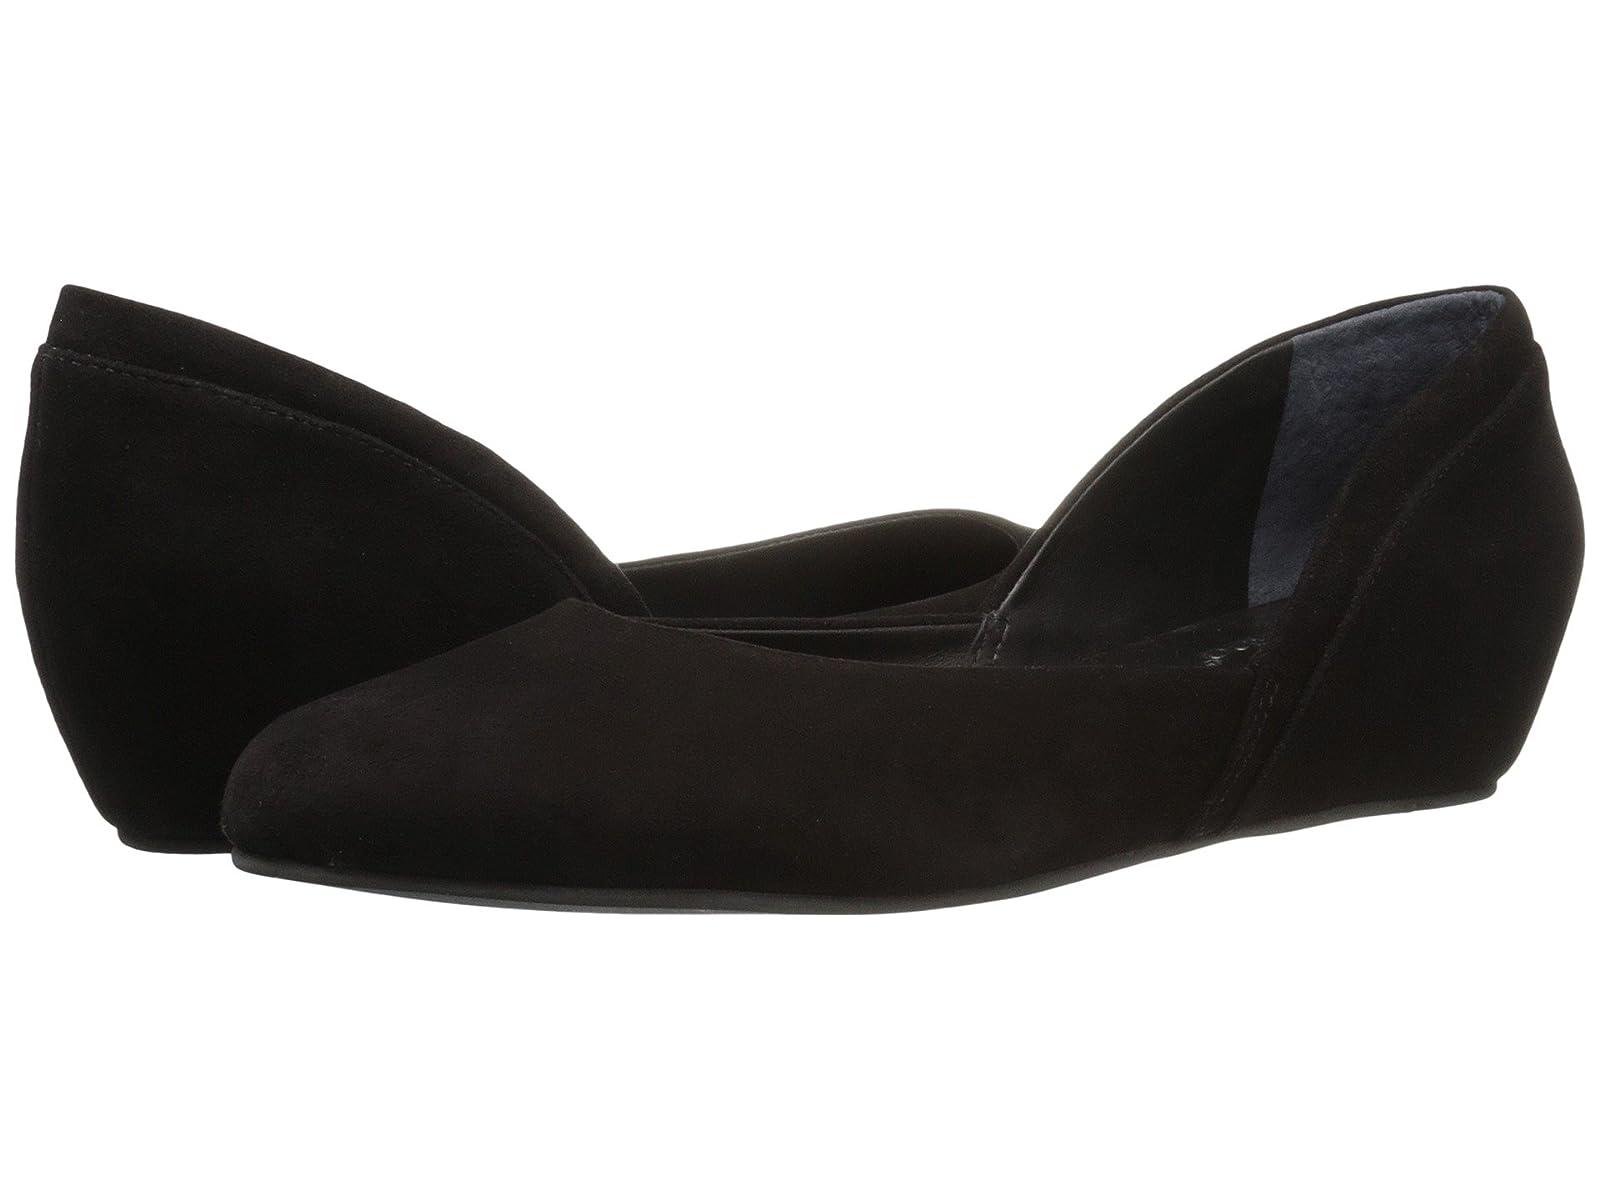 Bernardo NakitaCheap and distinctive eye-catching shoes